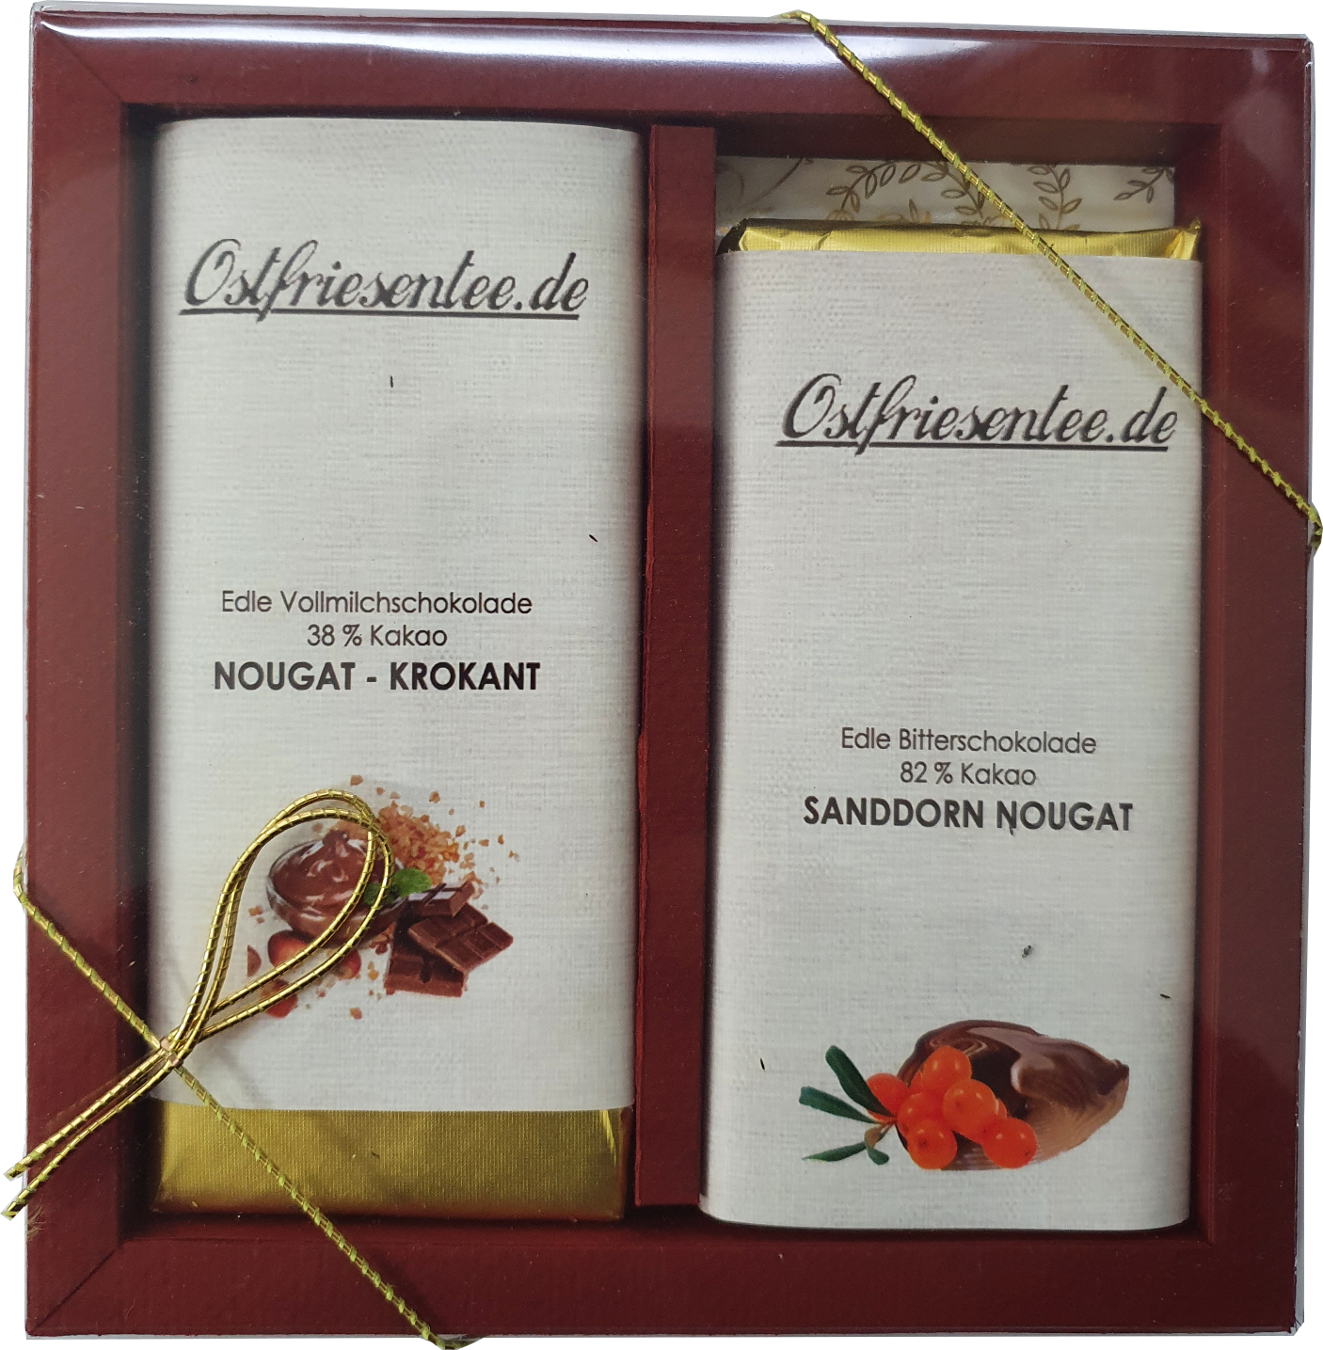 Geschenkset Schokolade - Nougat & Krokant